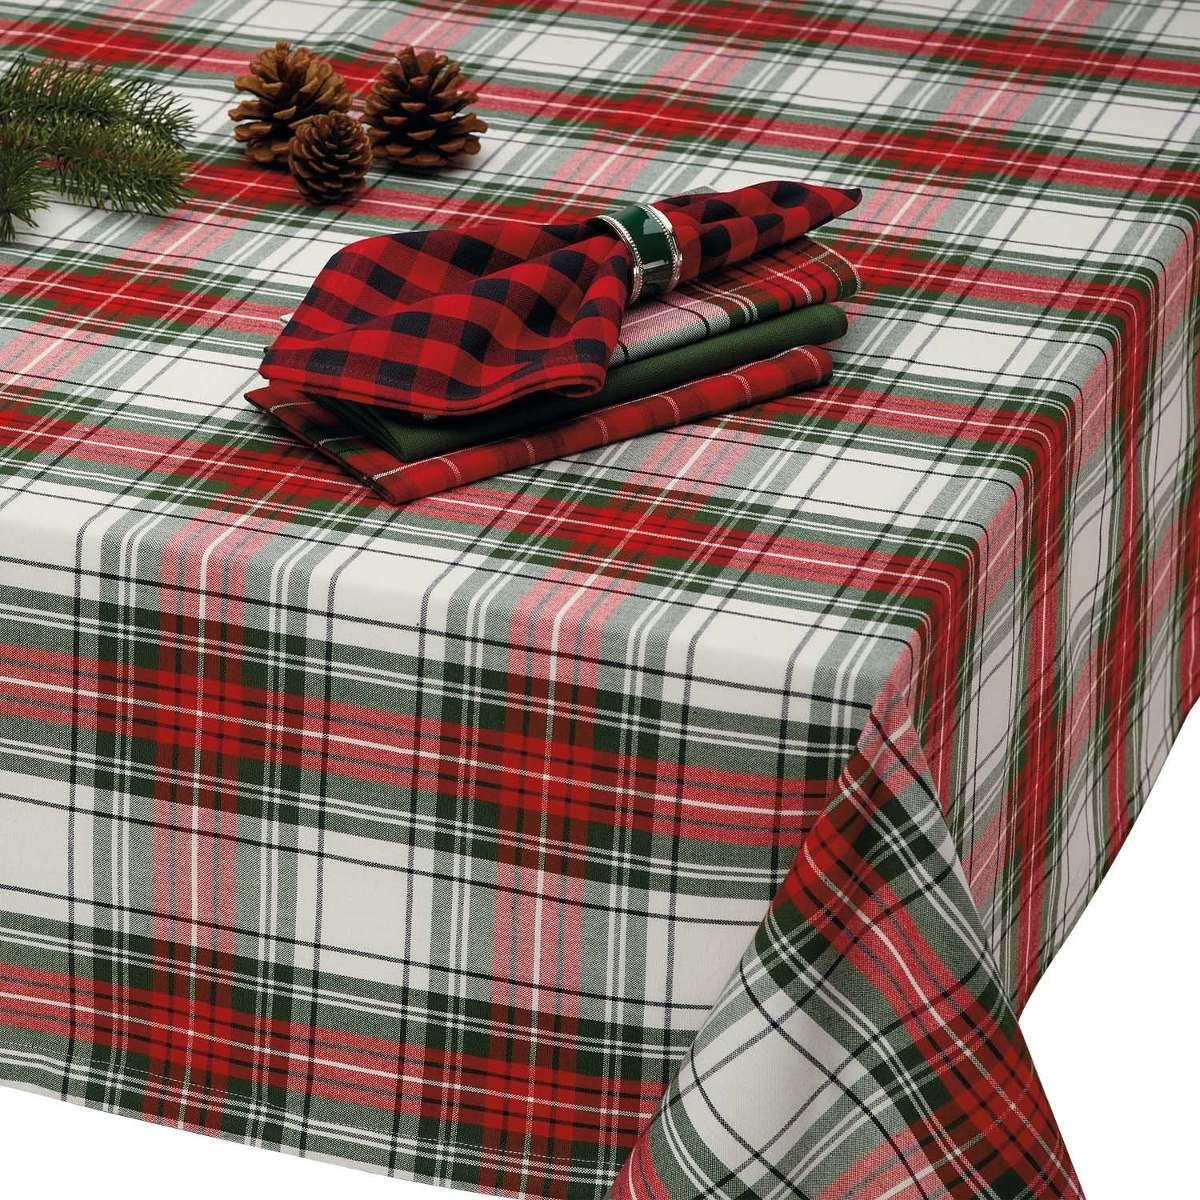 corredor de la tabla 3 Tamaños Navidad festiva Tartán Mantel Servilletas